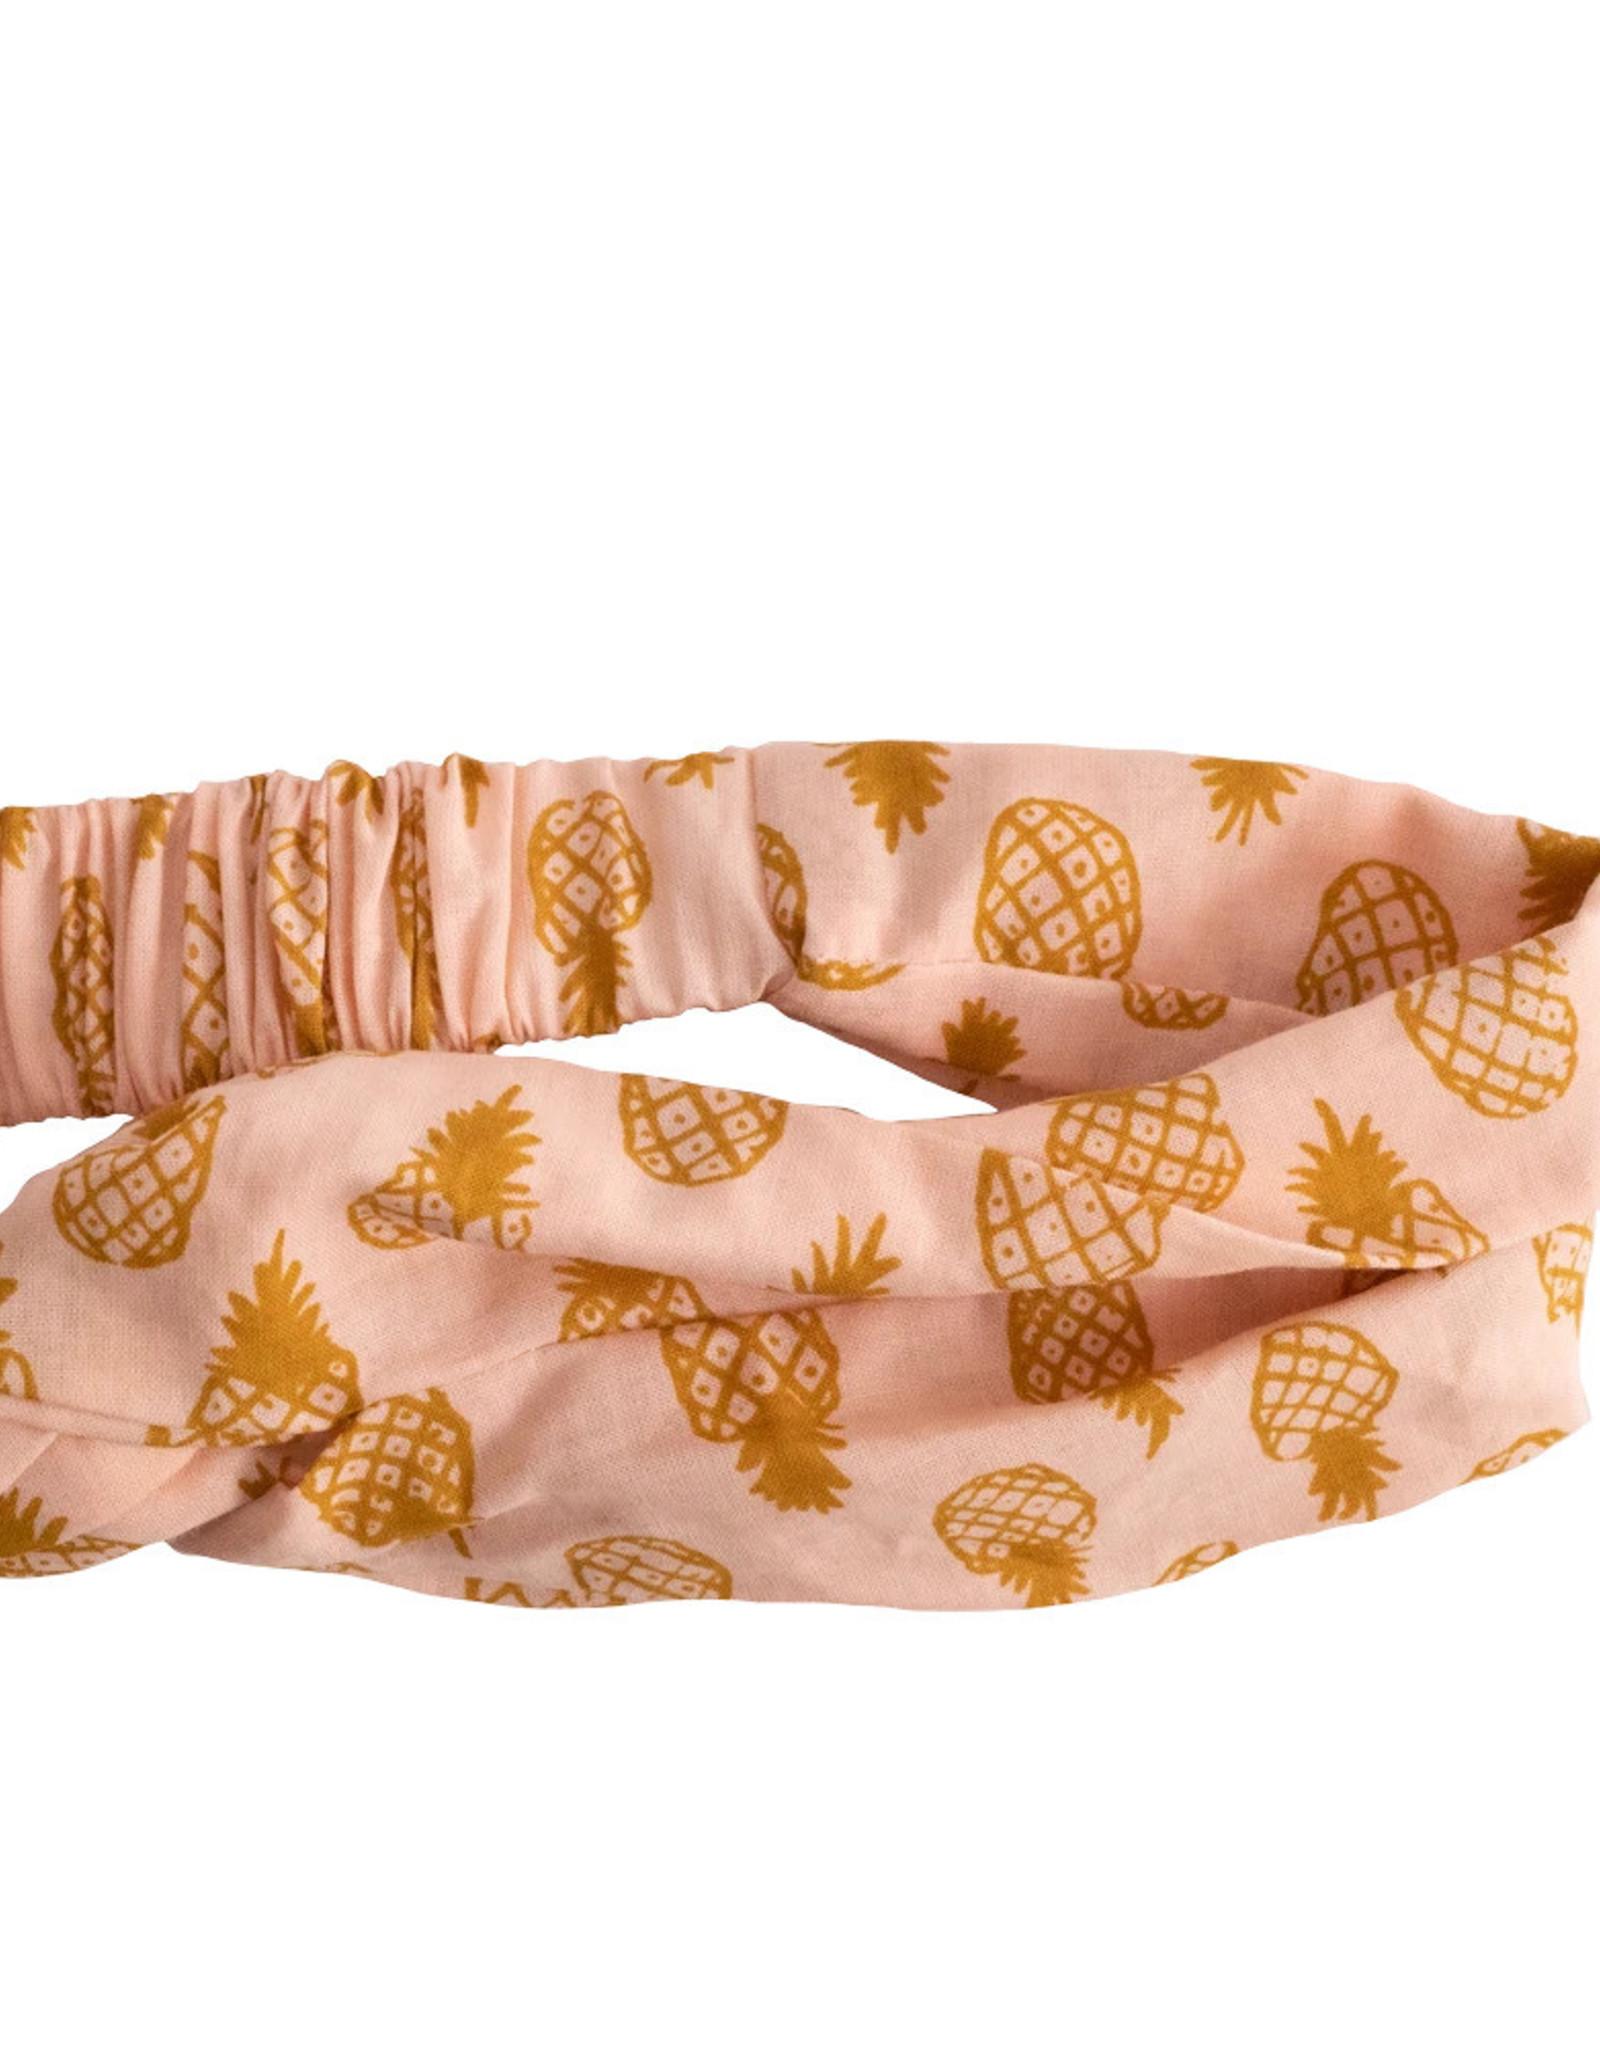 Hemlock Hemlock - Head Band - Pink Pinapple